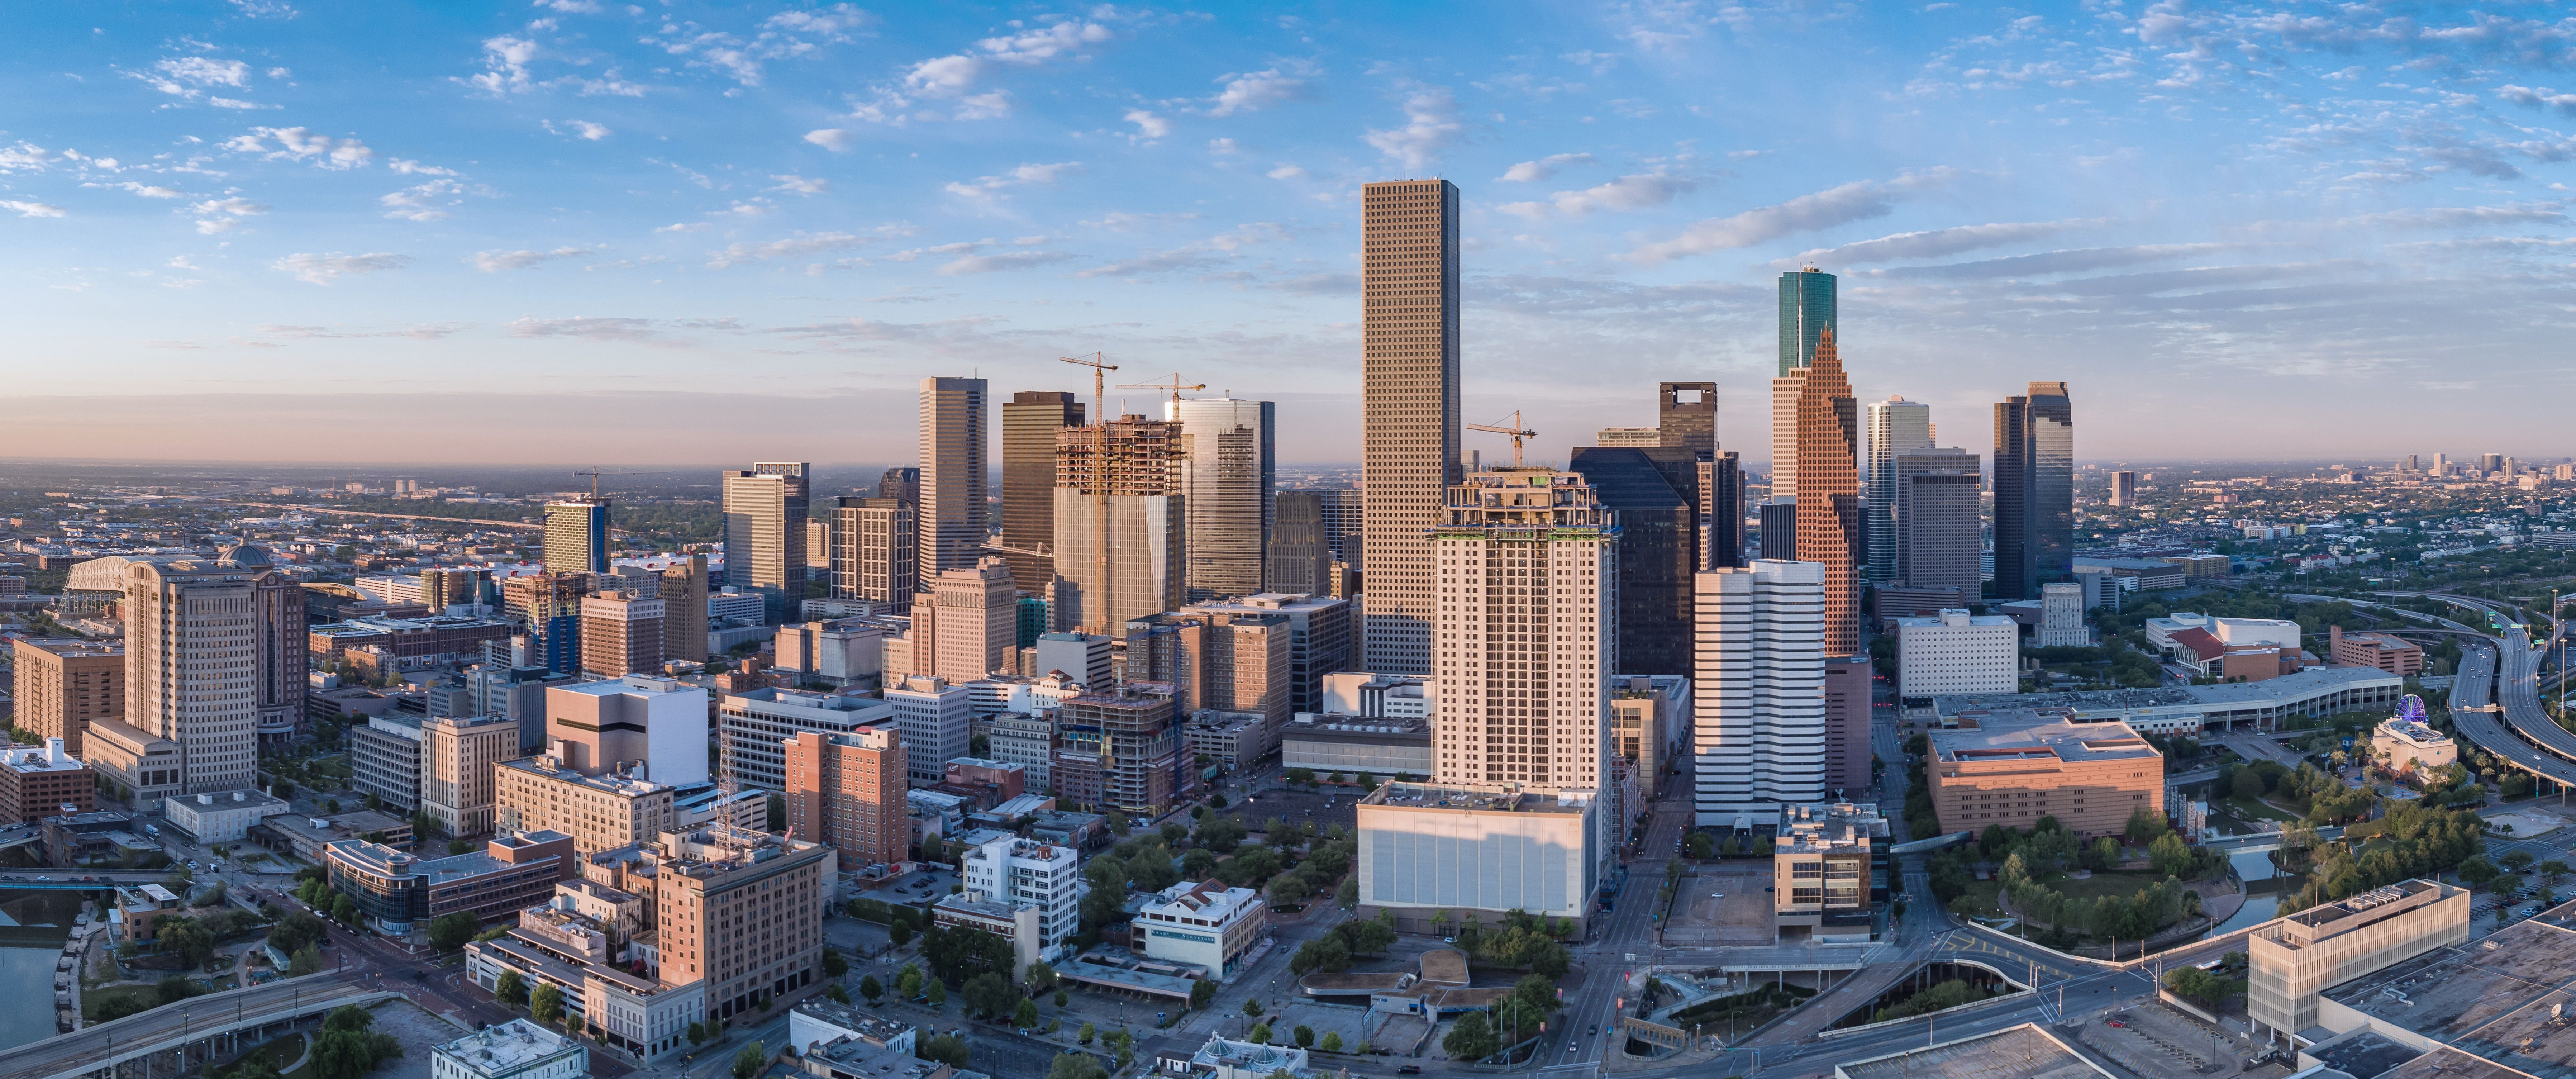 Houston (CBD) 2018 ERI Report